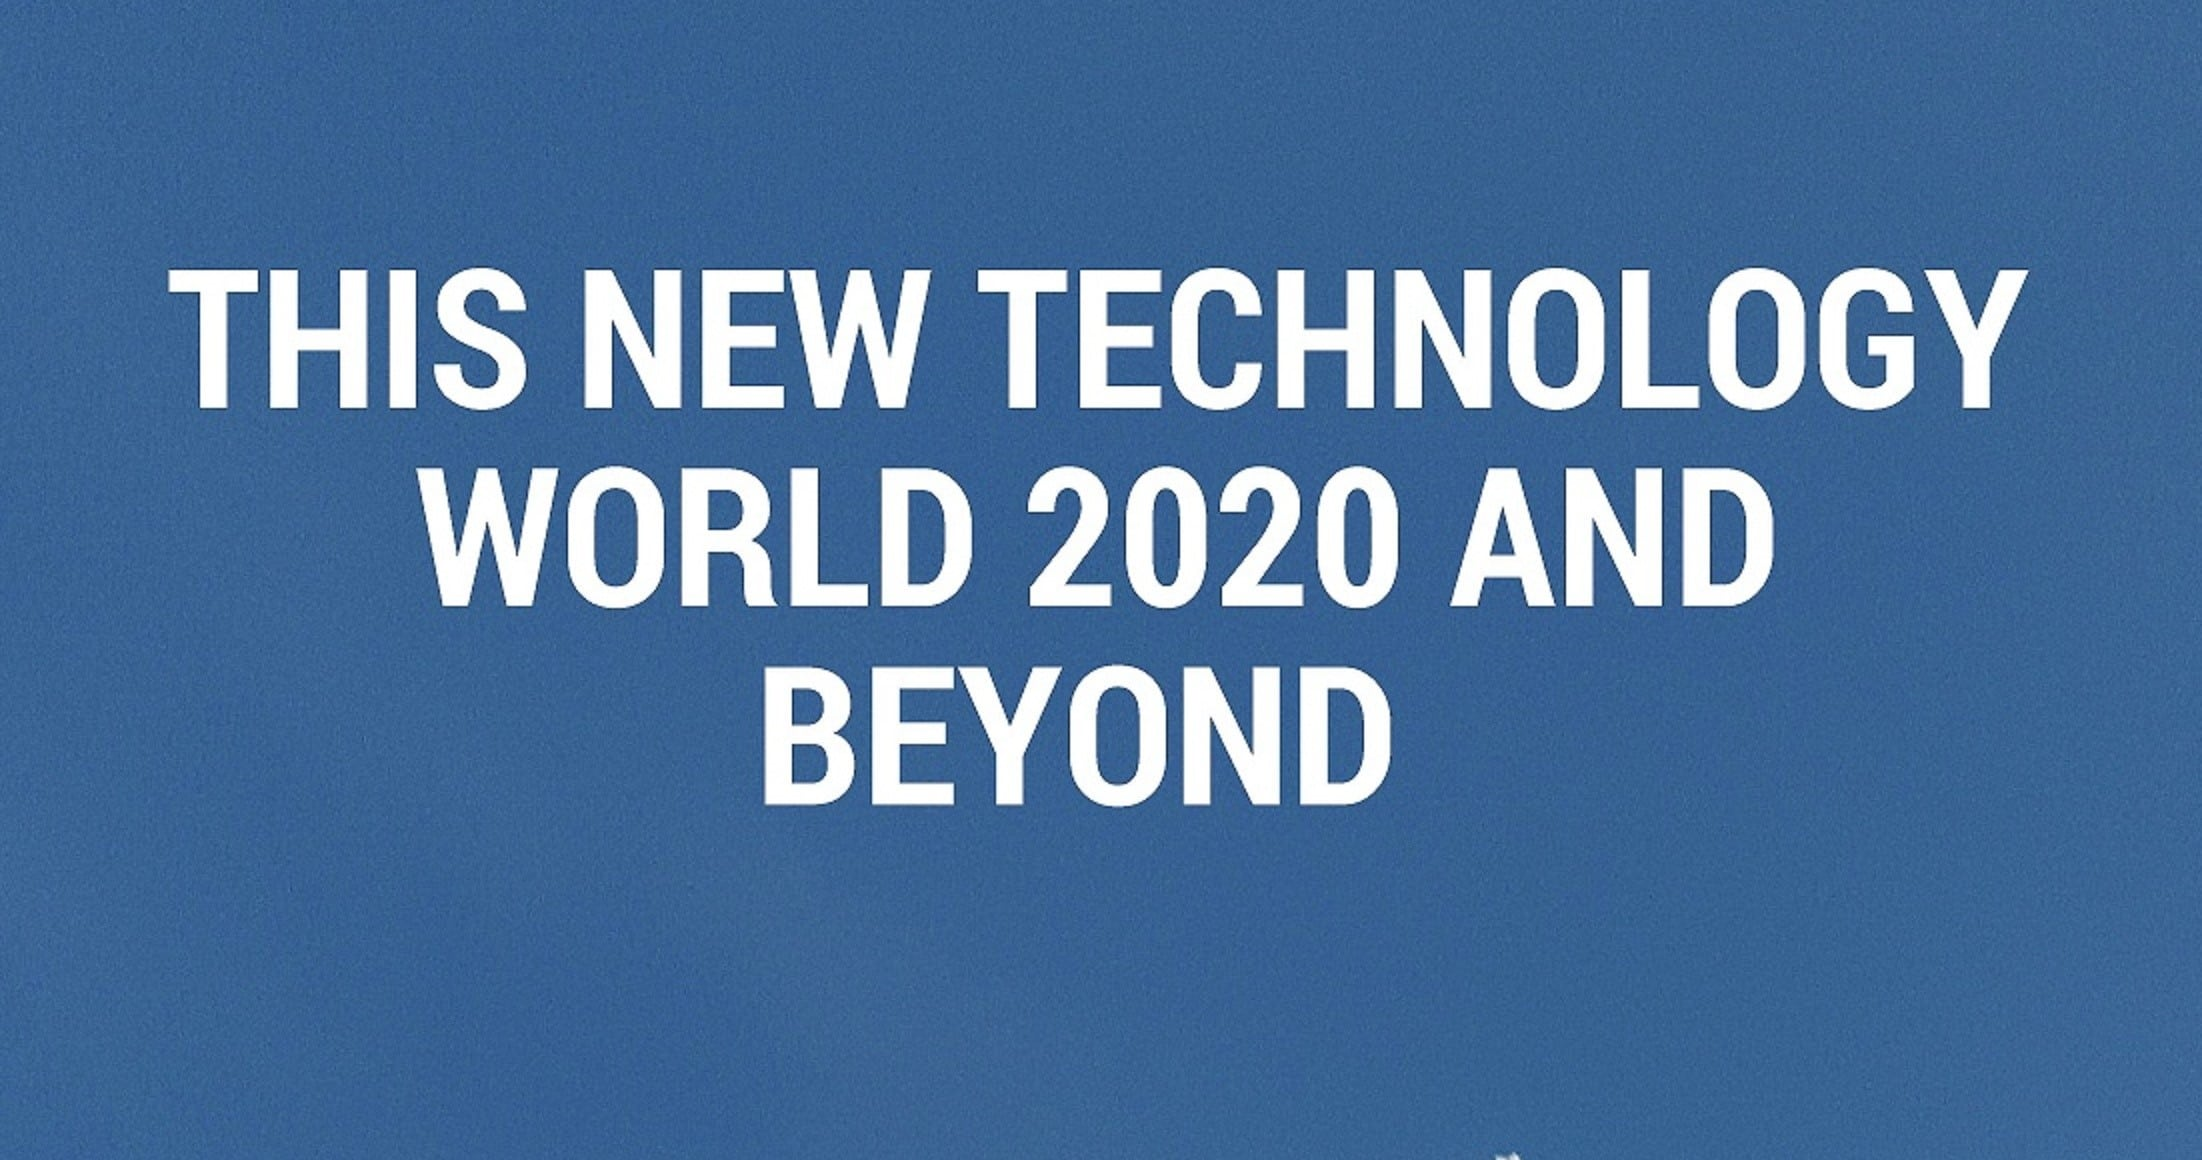 Errol van Engelen: This new technology world 2020 and beyond